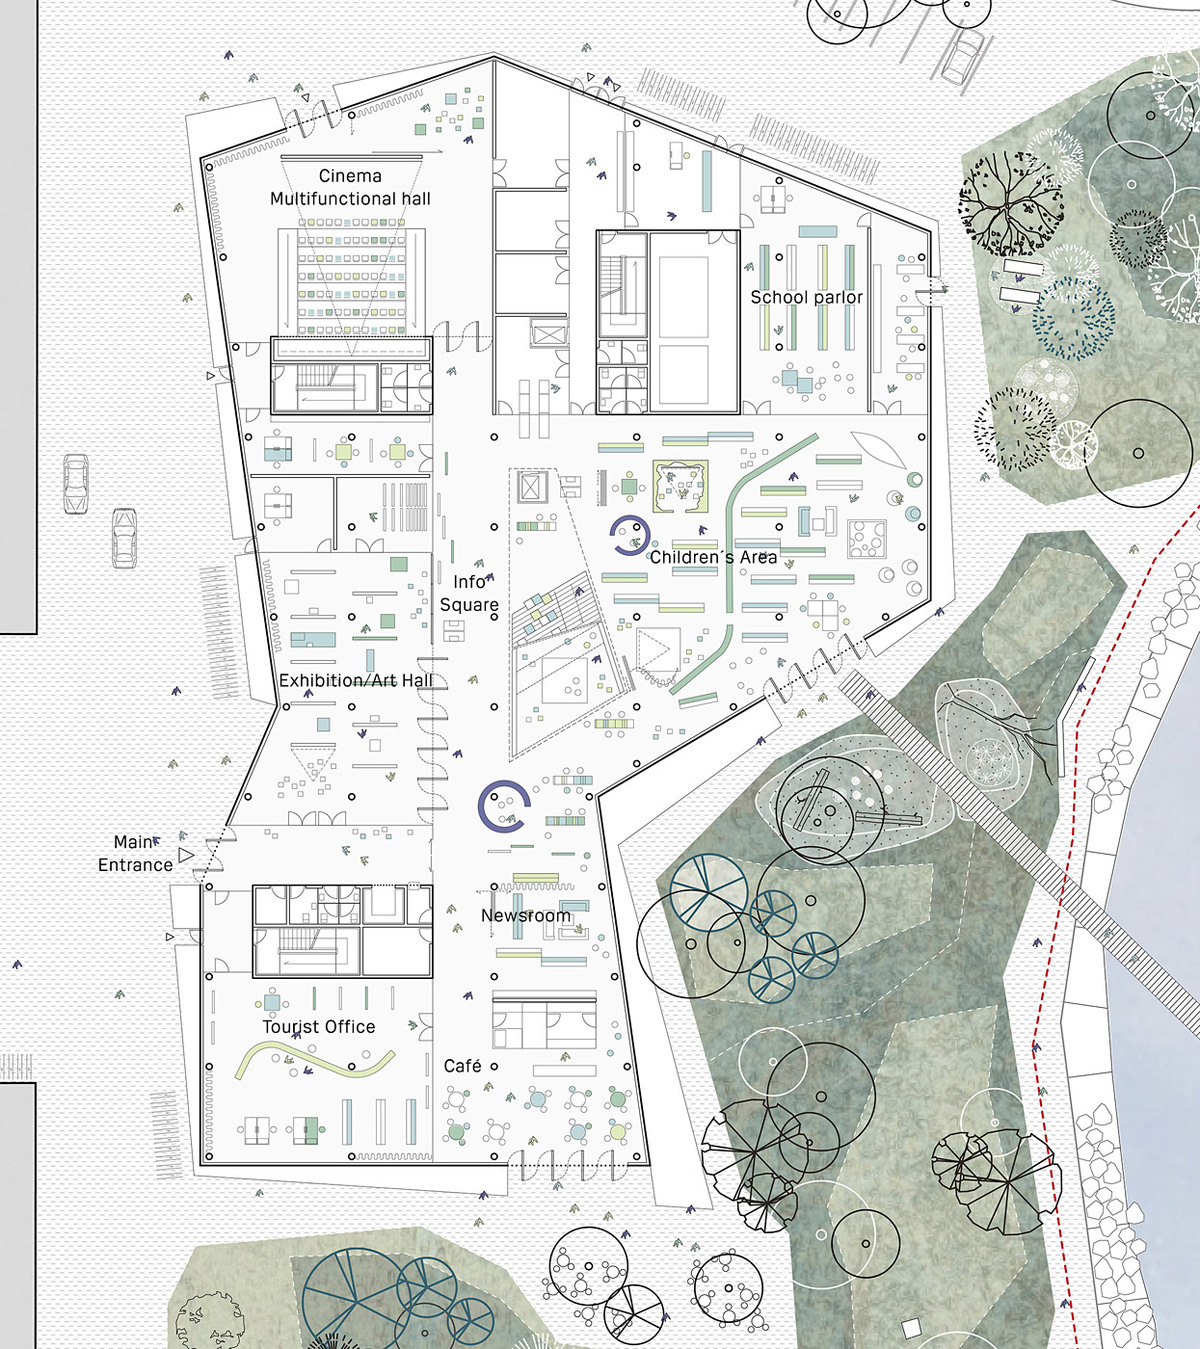 Ground floor plan (Image: schmidt hammer lassen architects)